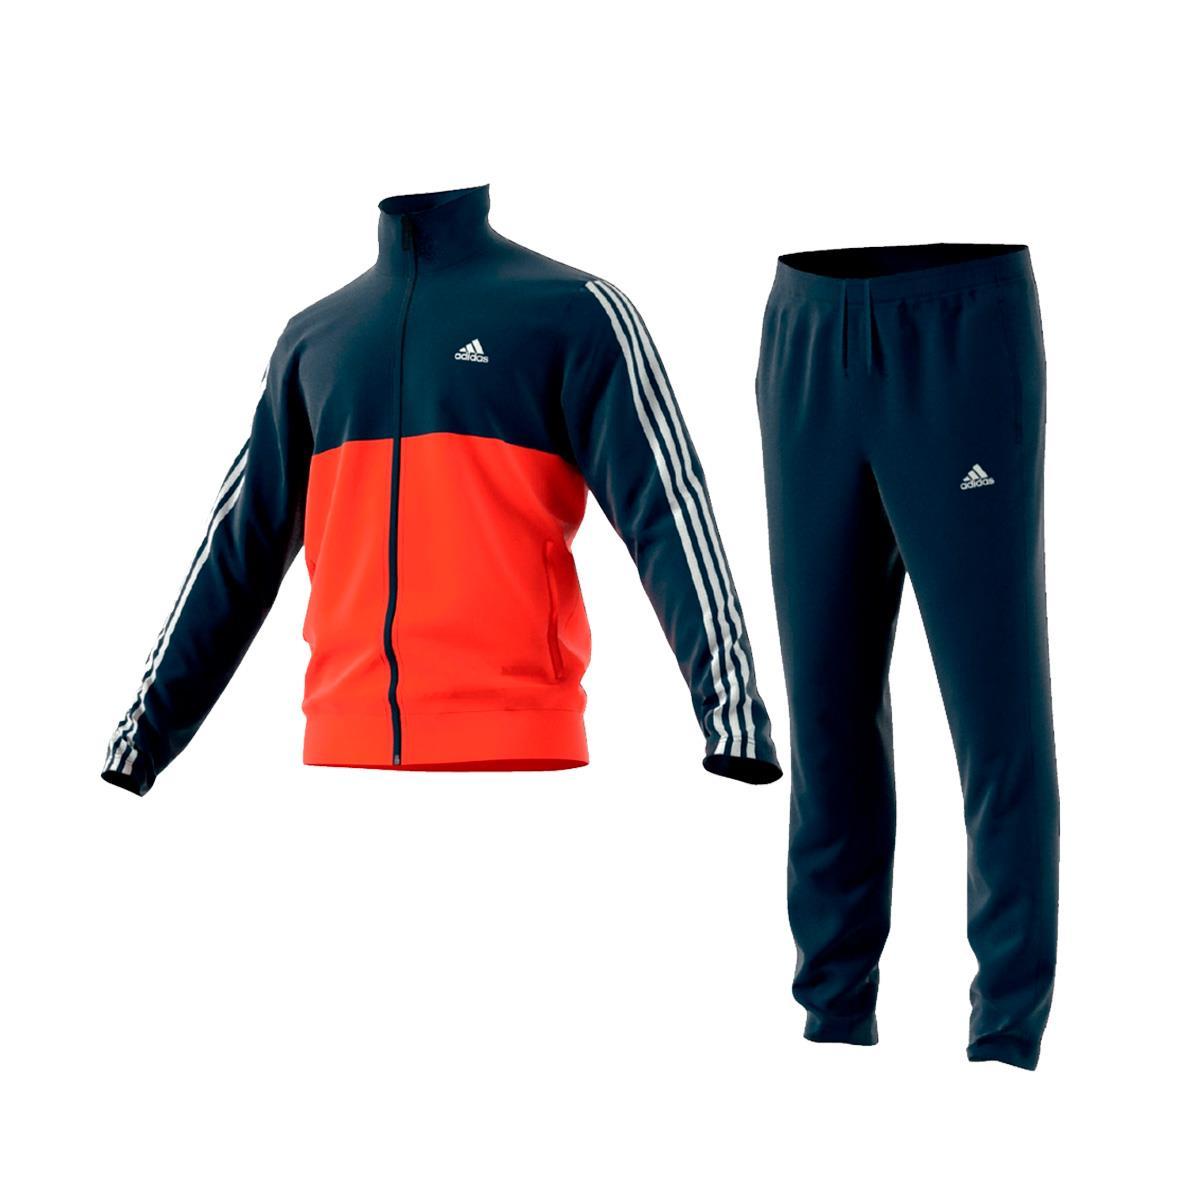 Agasalho Adidas Back2Bas 3S Masculino Preto c0b2ea1087657